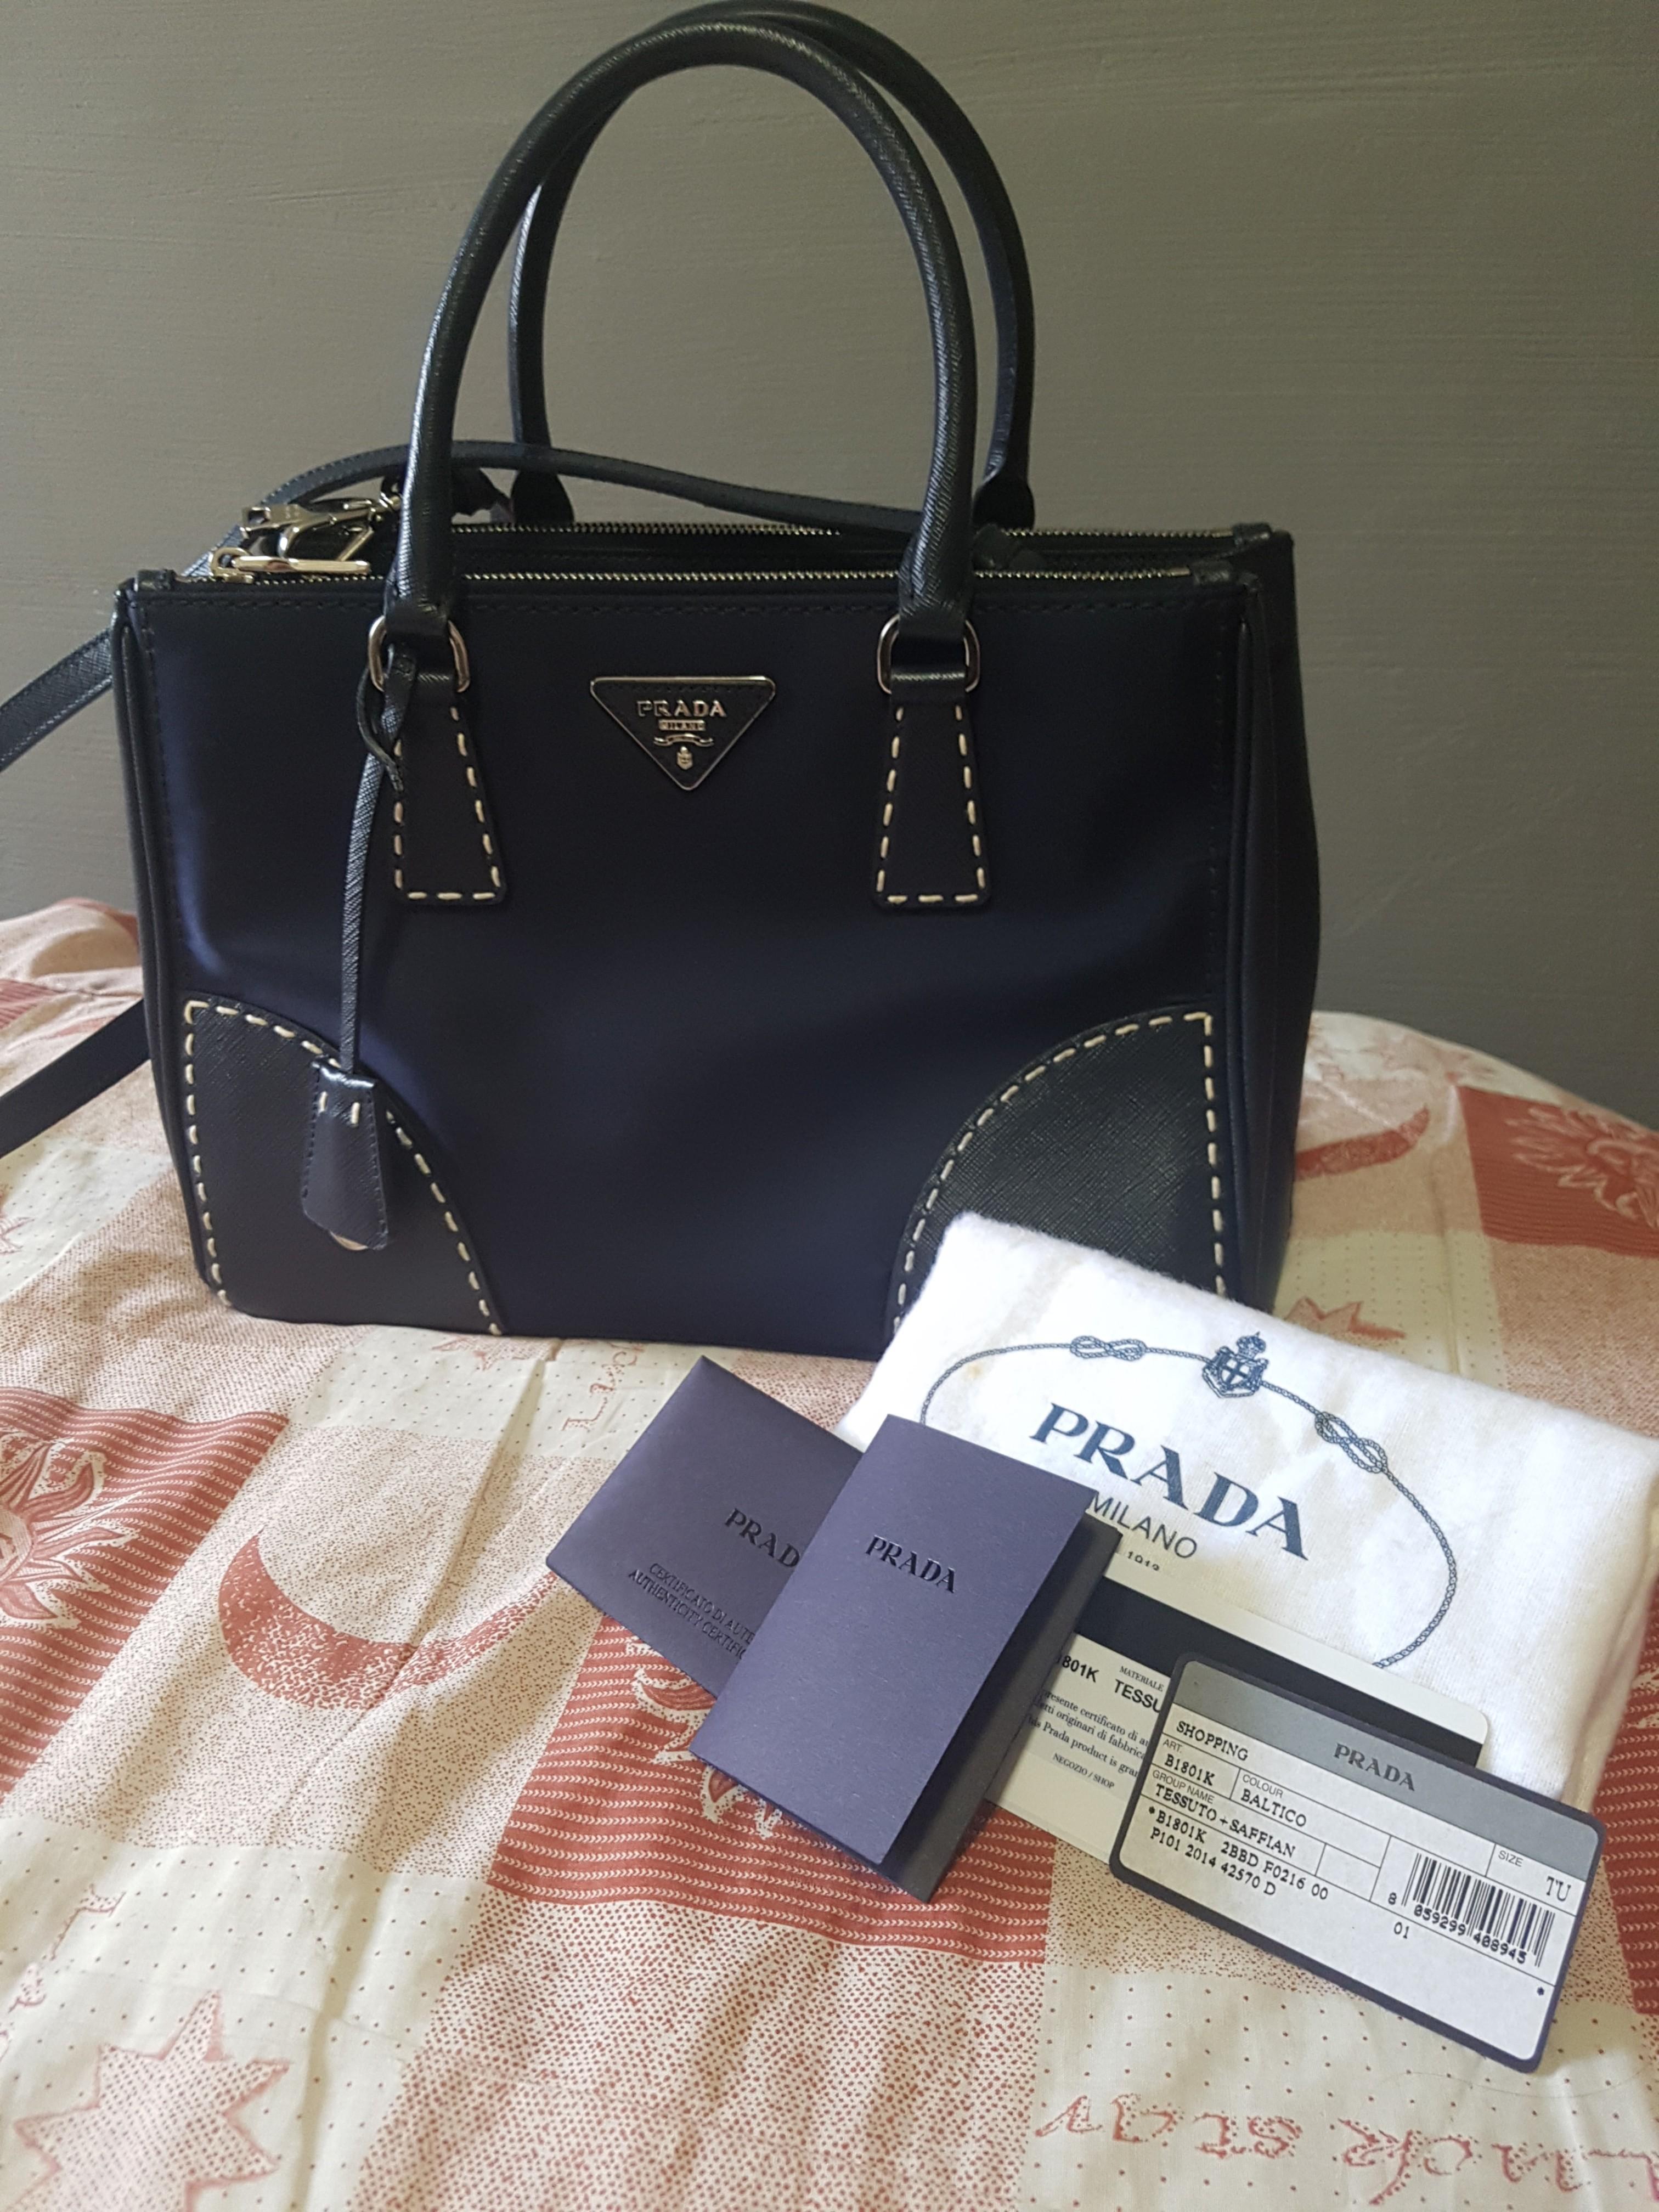 887d37997d2 Prada B1801K Tessuto + Saffiano Bag, Luxury, Bags   Wallets, Handbags on  Carousell